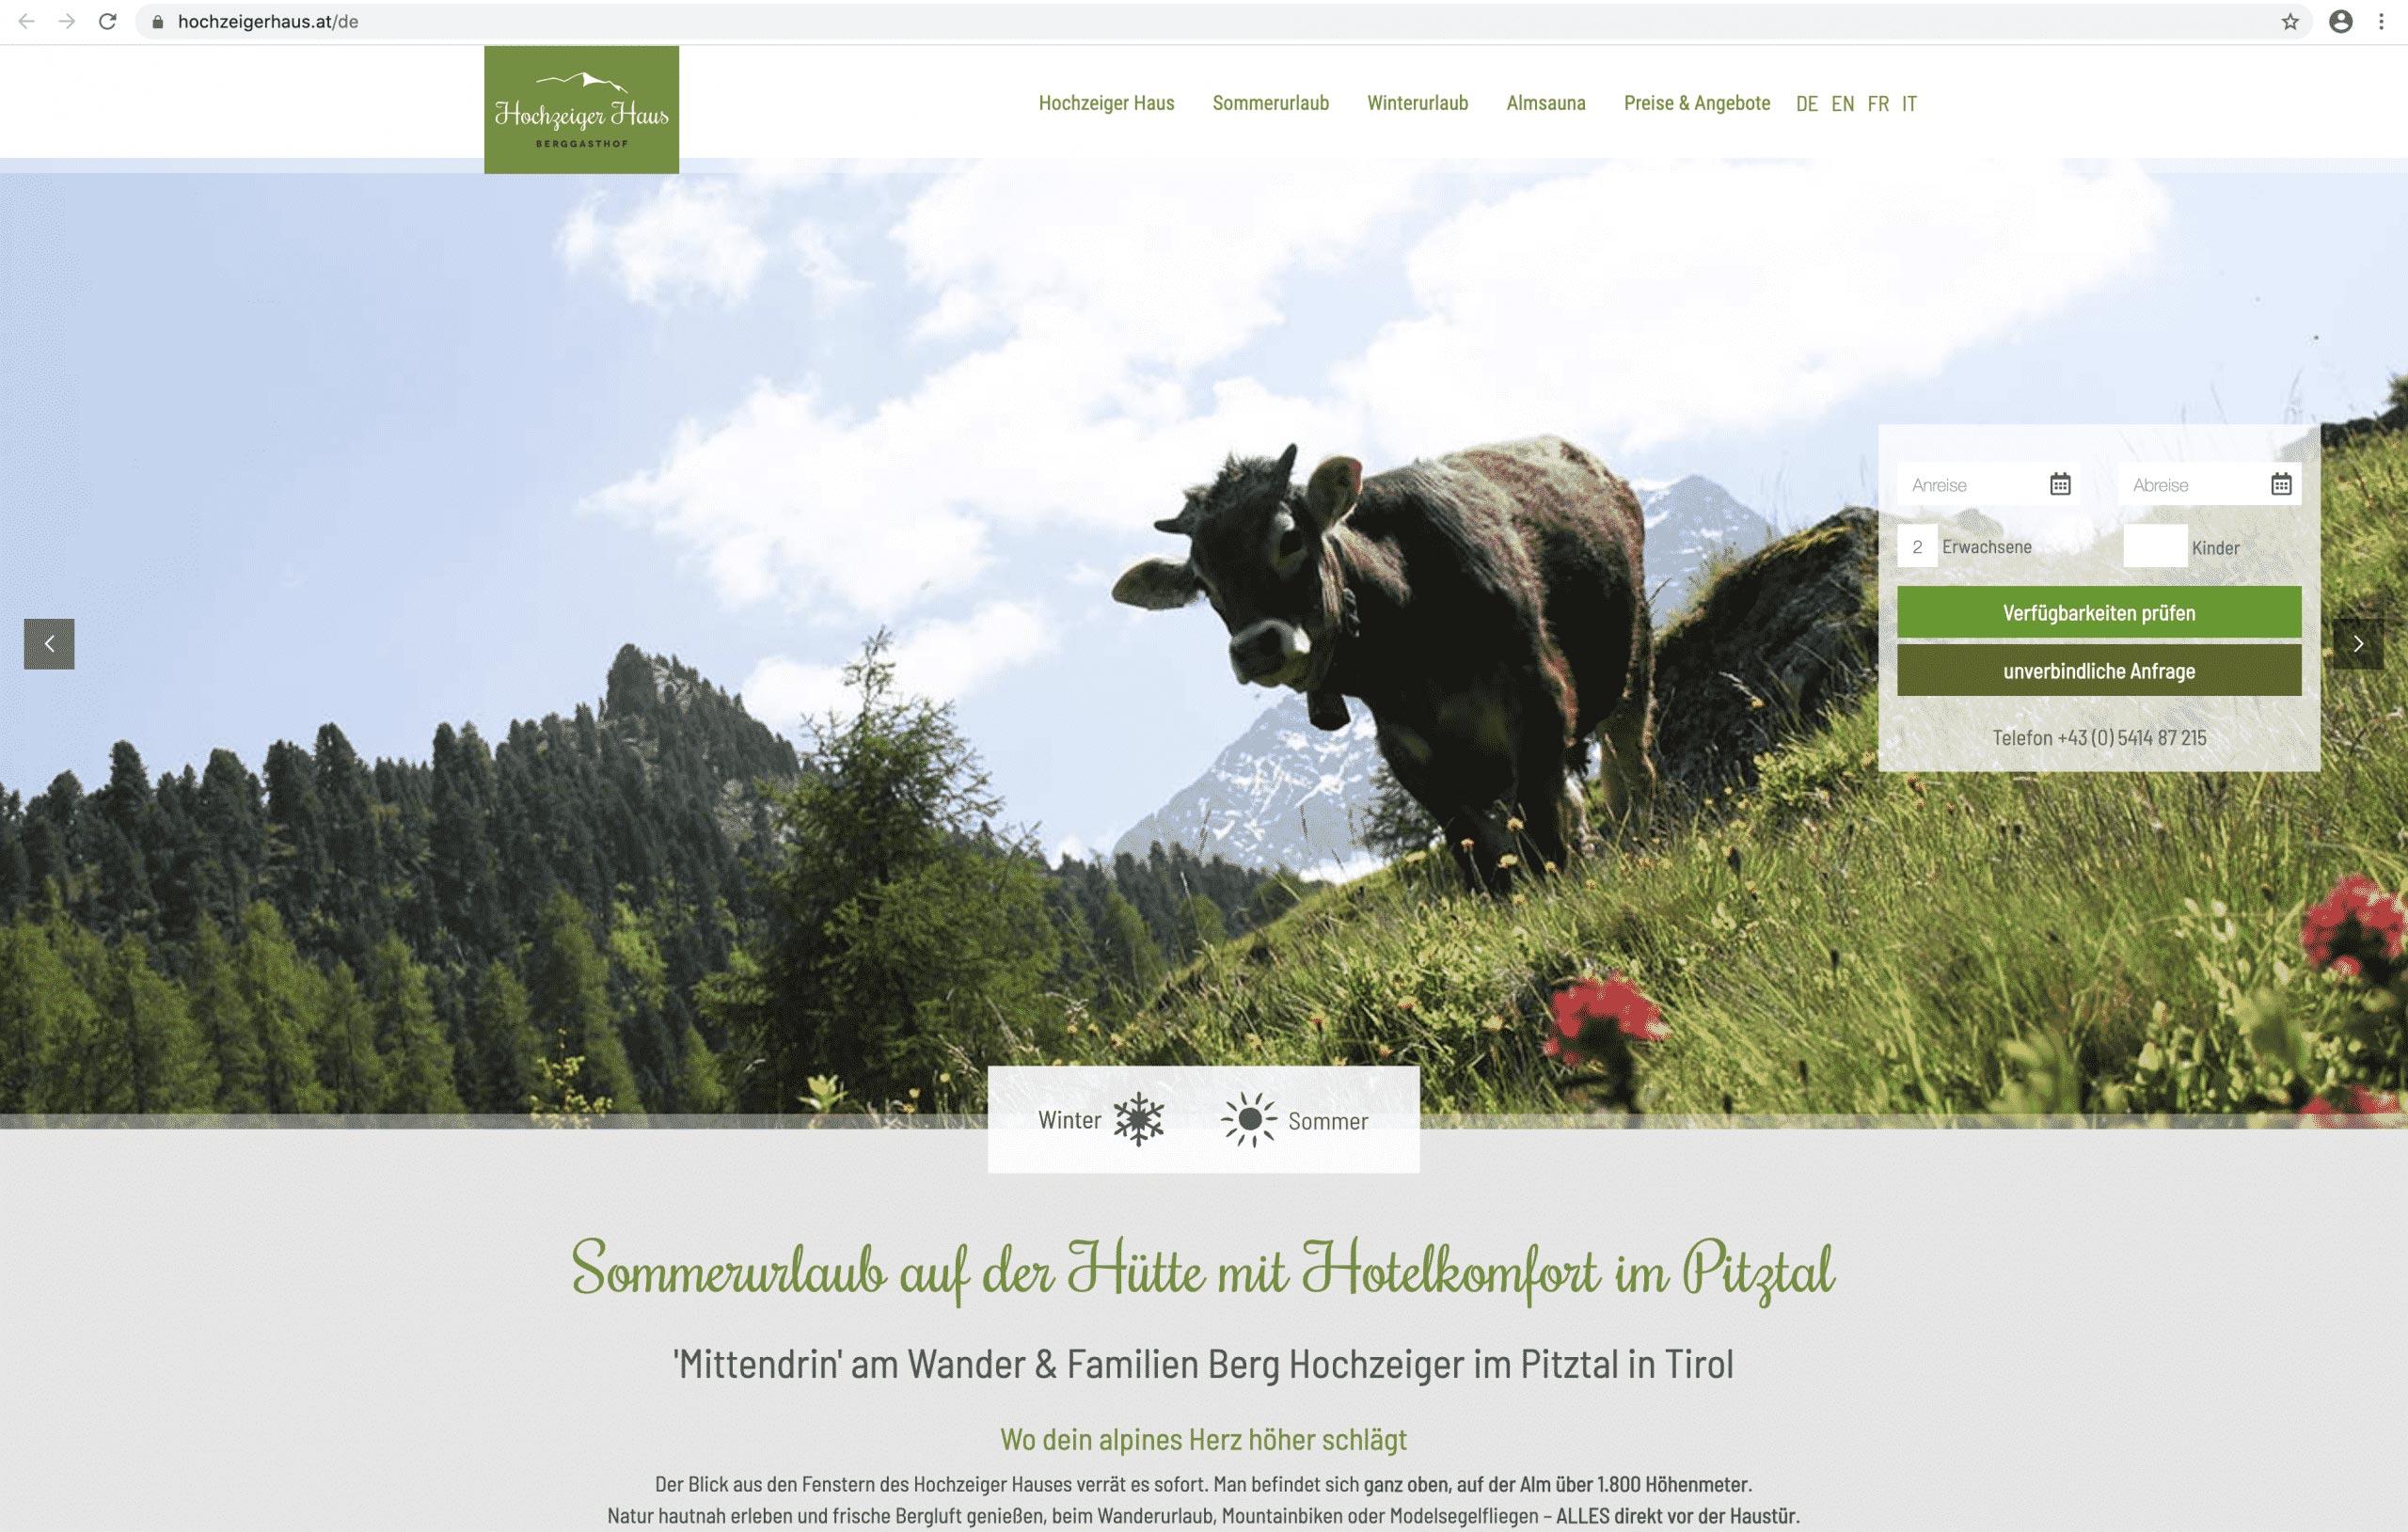 hochzeiger-haus-pitztal-screen